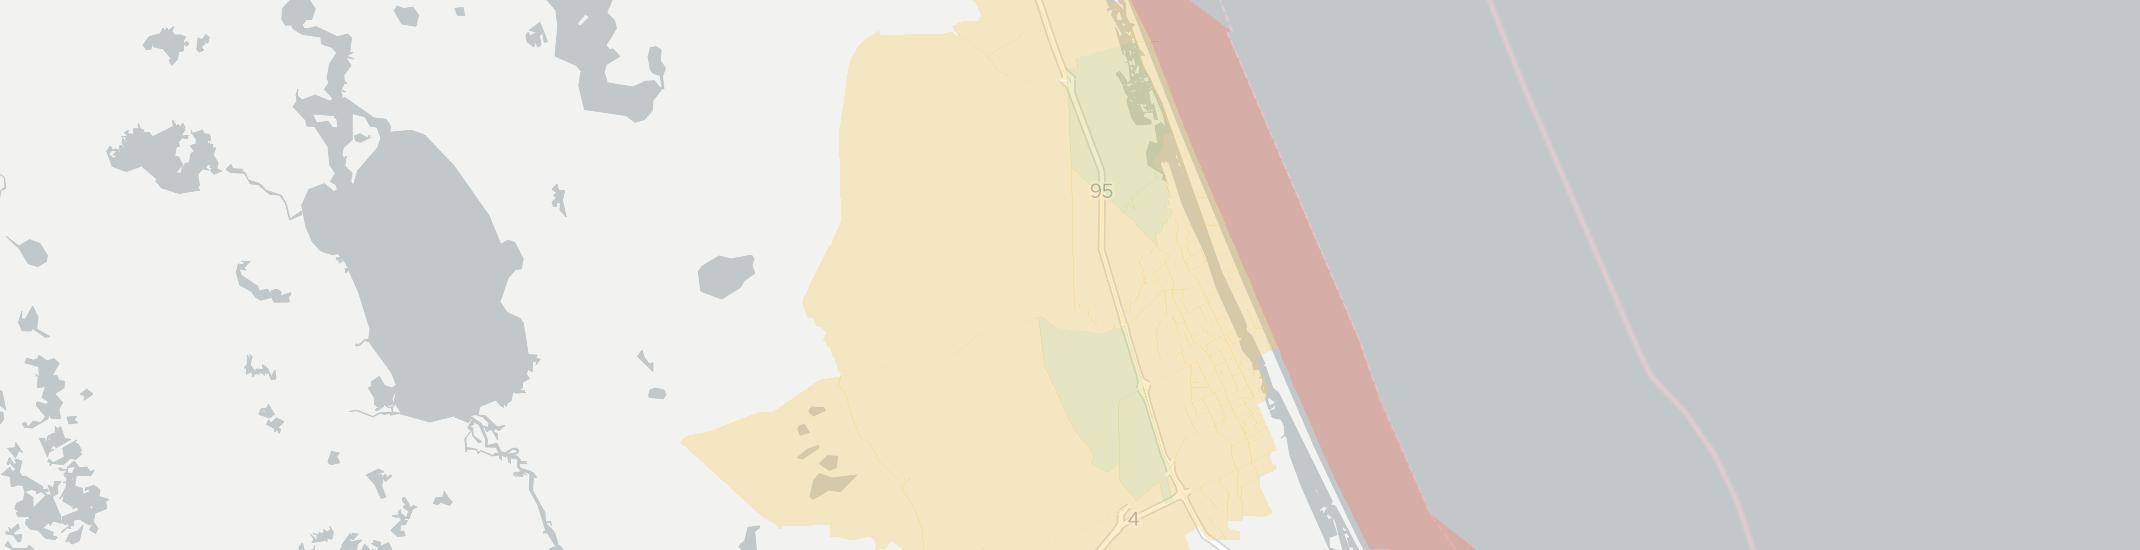 Map Of Ormond Beach Florida - Street Map Of Ormond Beach Florida